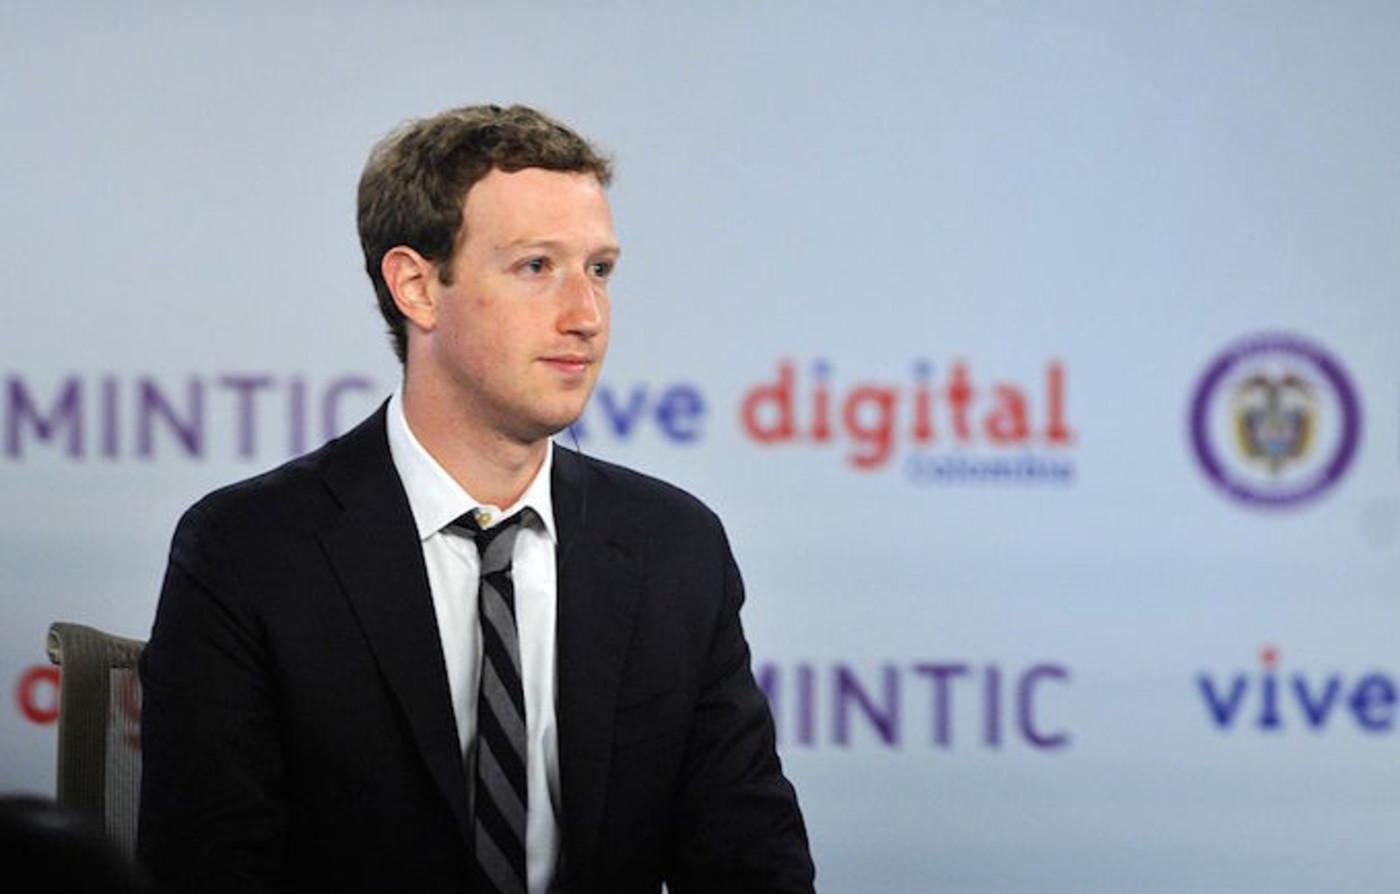 Mark Zuckerberg Ads